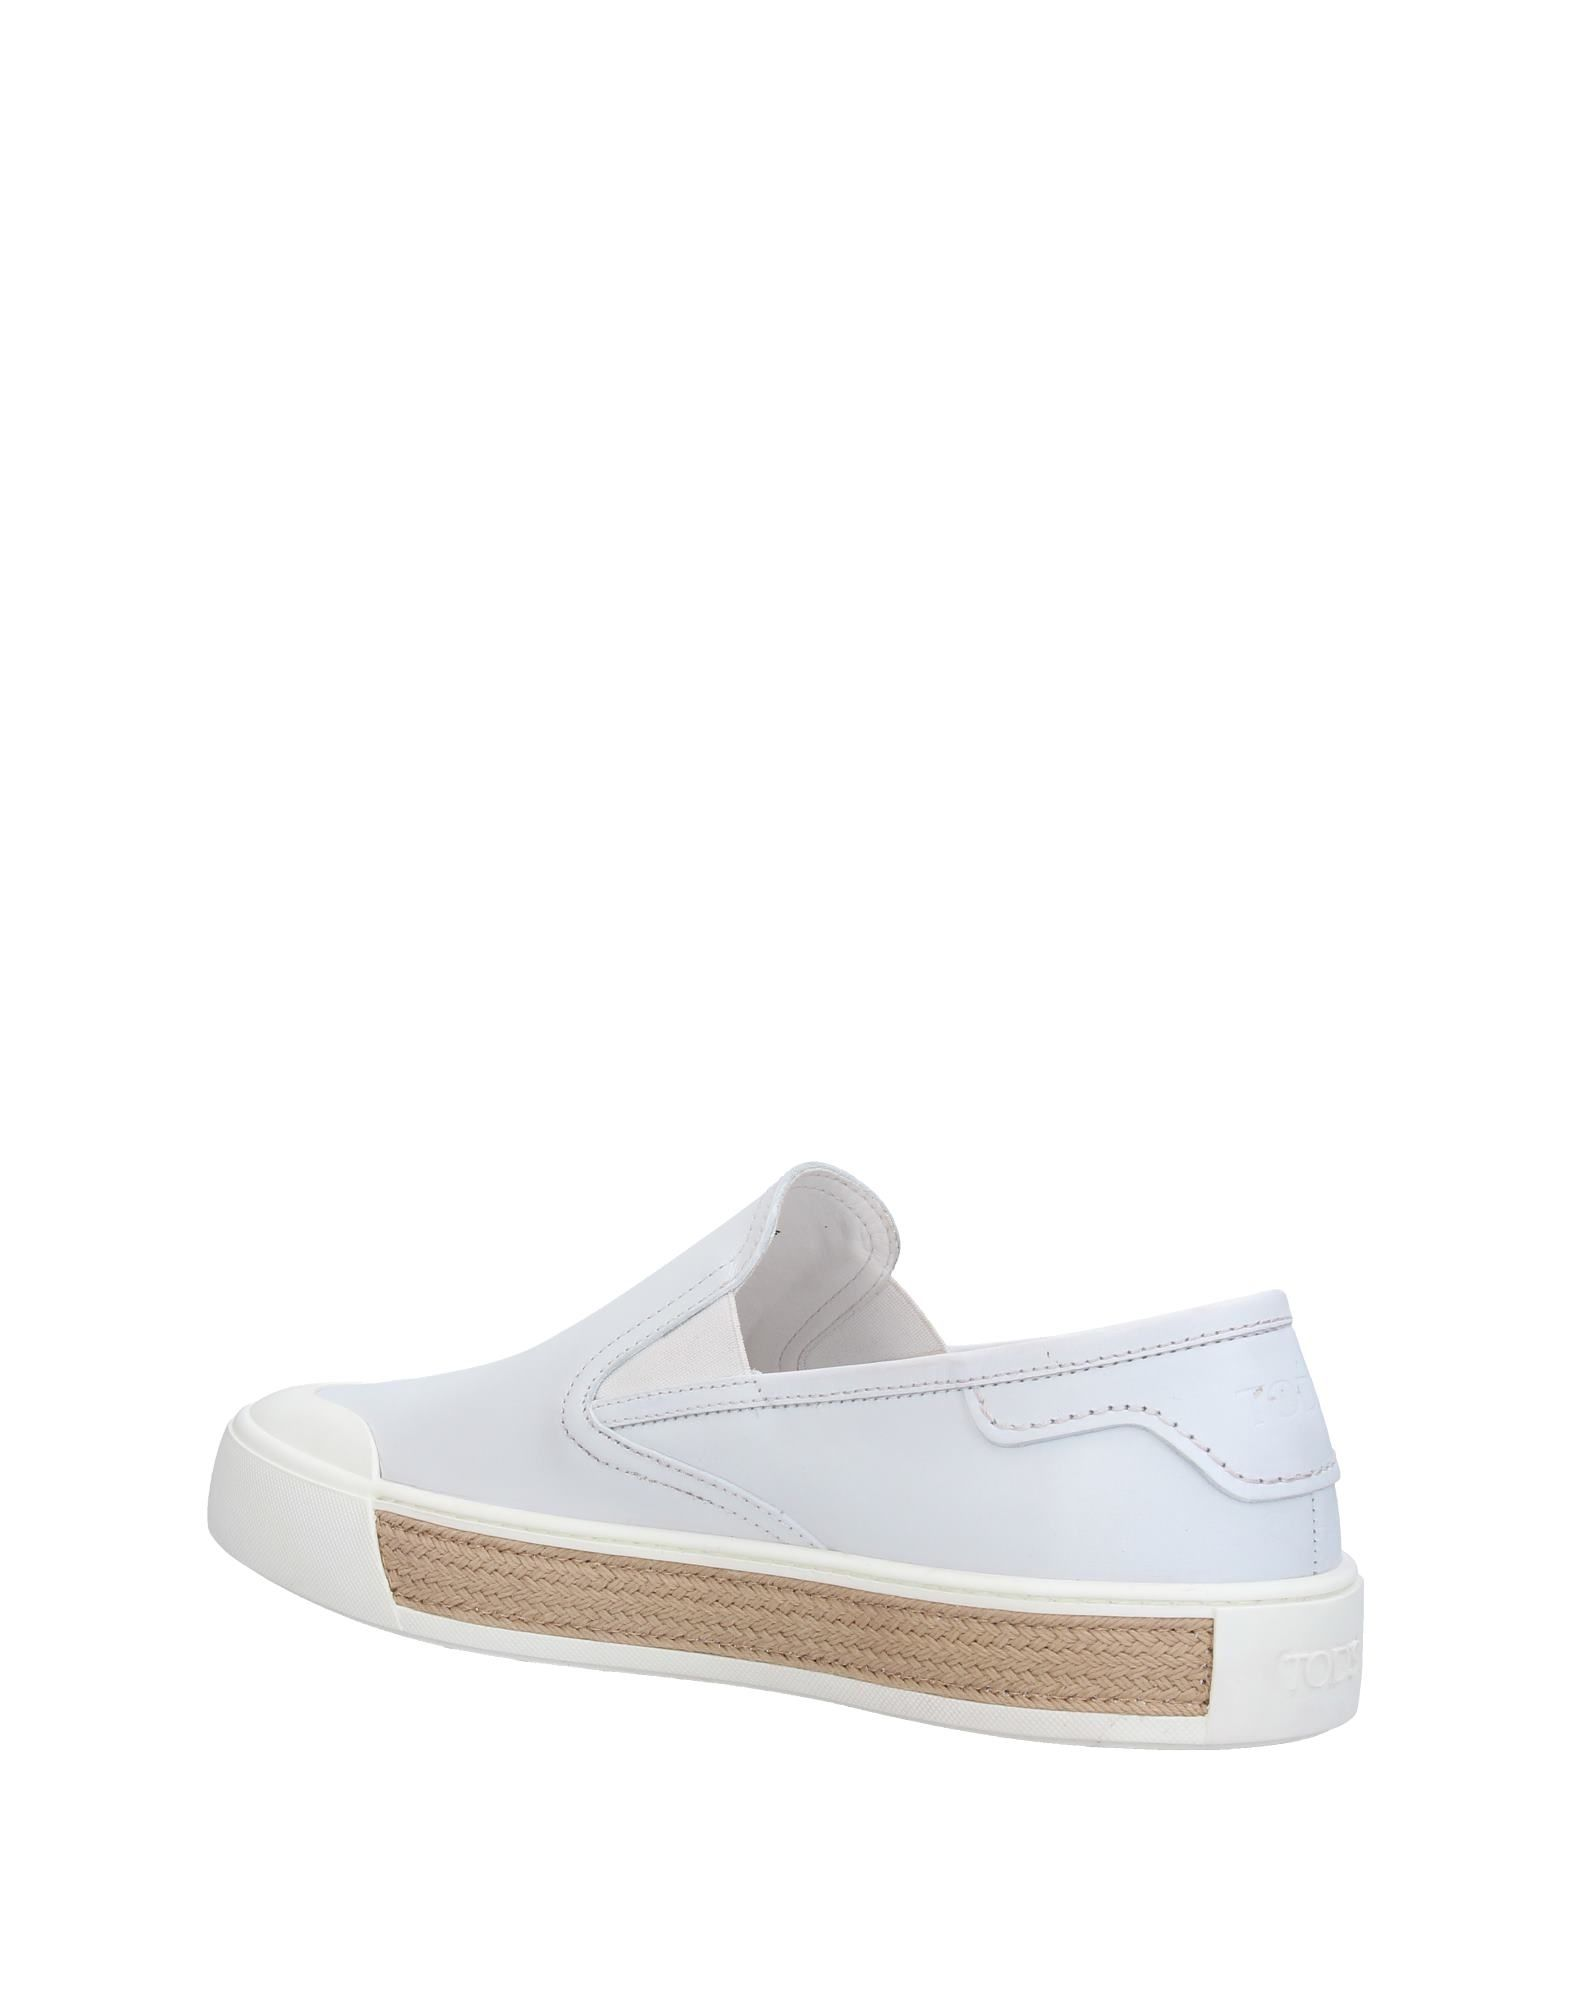 Tod's Sneakers Herren Qualität  11398392NL Gute Qualität Herren beliebte Schuhe e3c94c